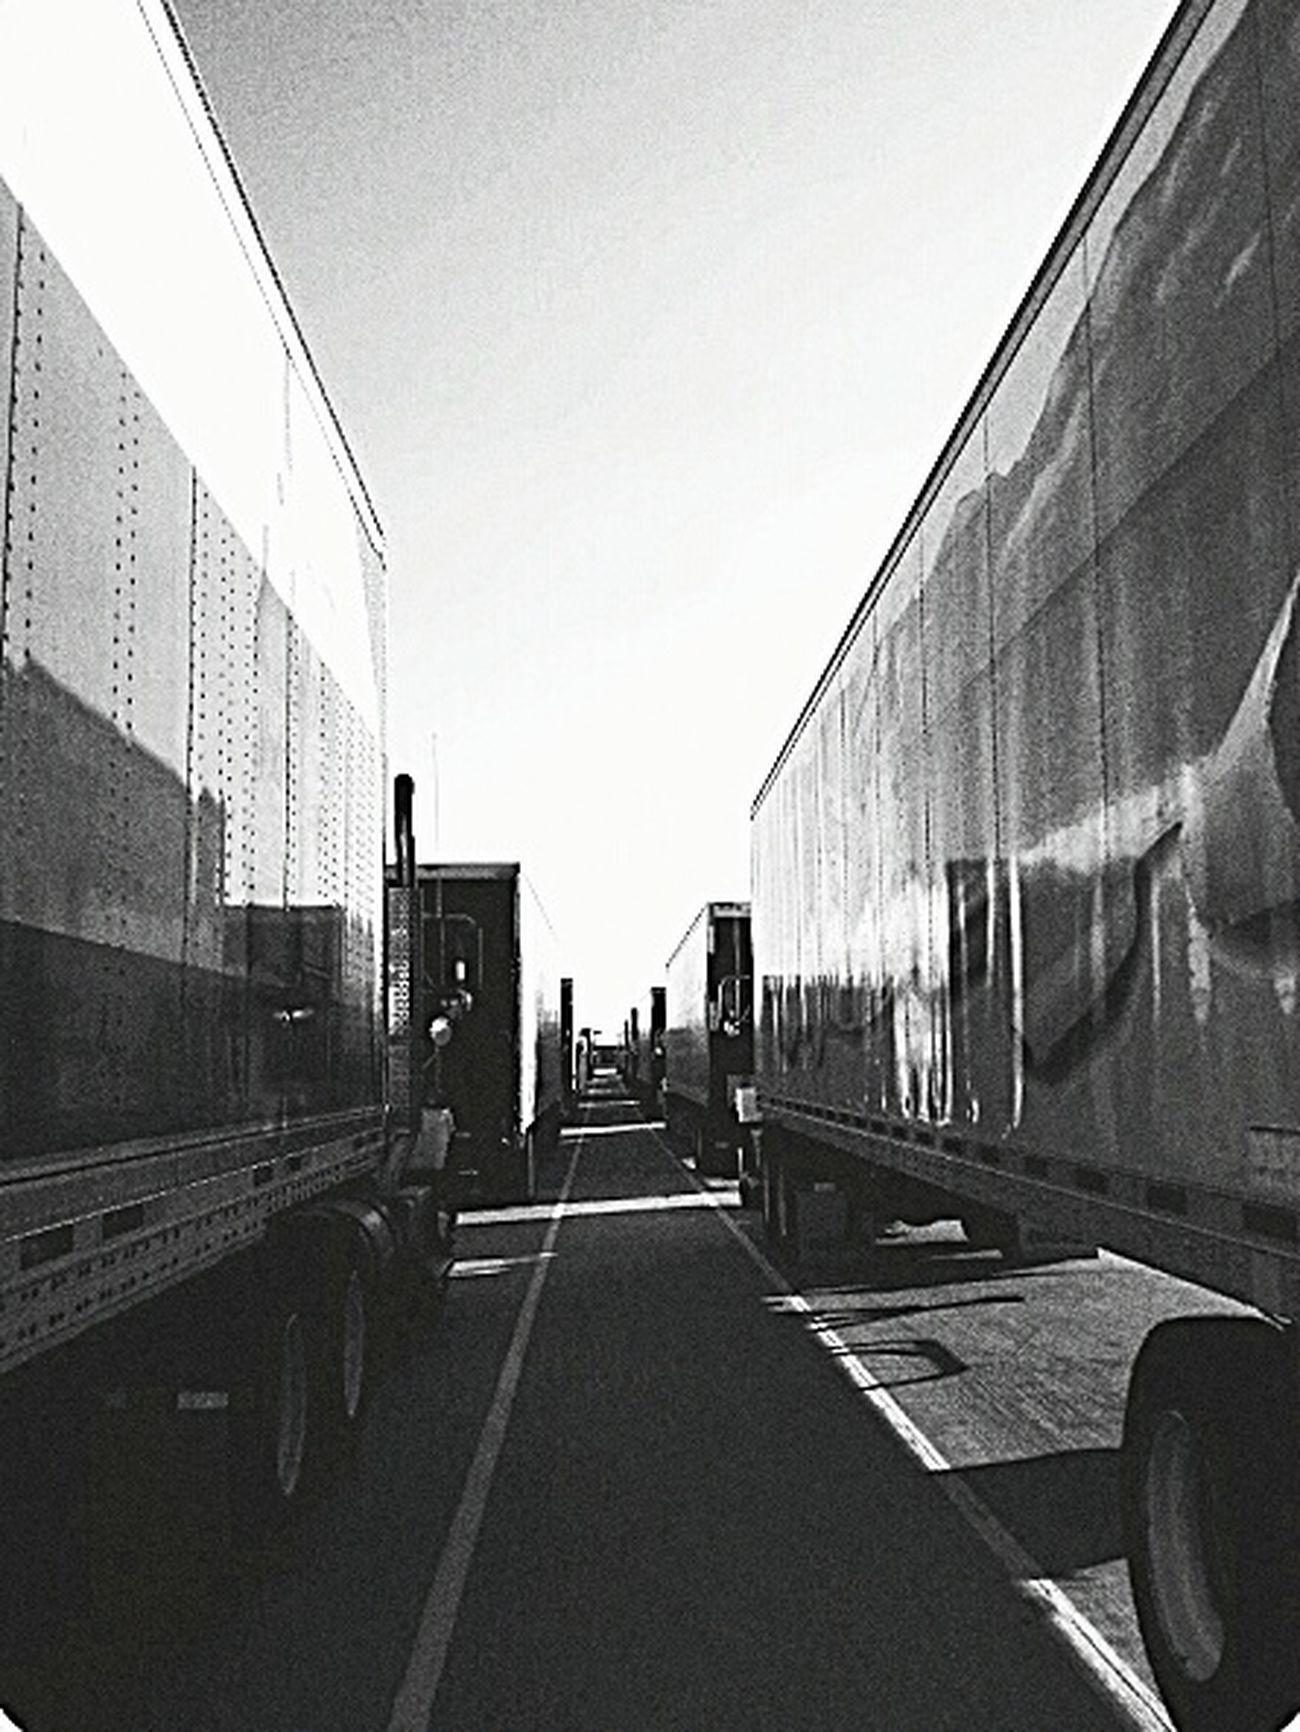 Trucks 18wheeler Random Trucking BeerTruck Picoftheday Black And White Photography Truckerslife